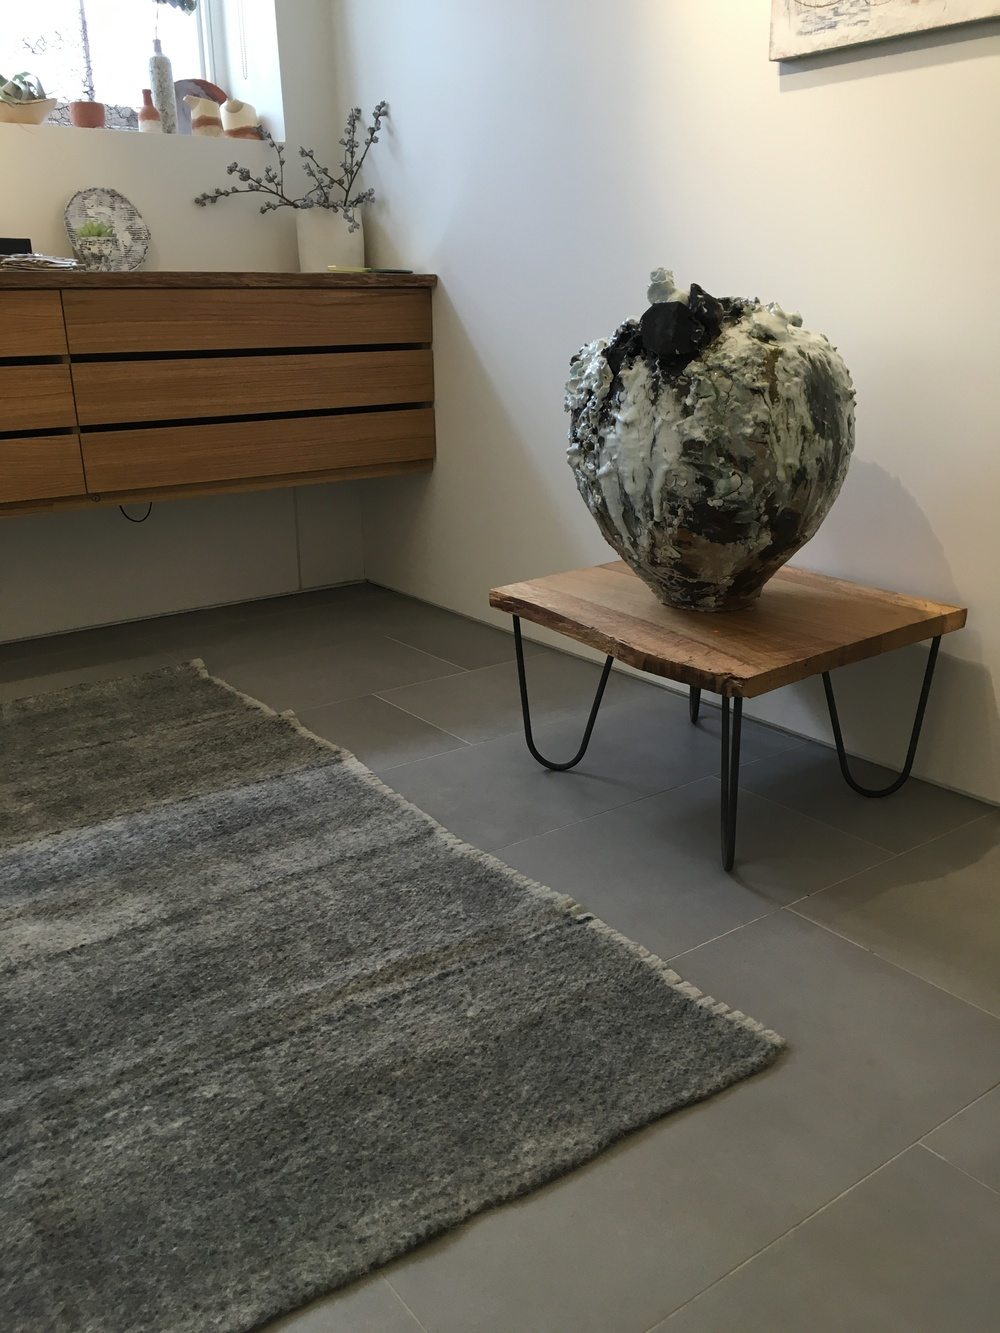 Akiko Hirai's Moon Jar, with radhi rug at Flow Gallery